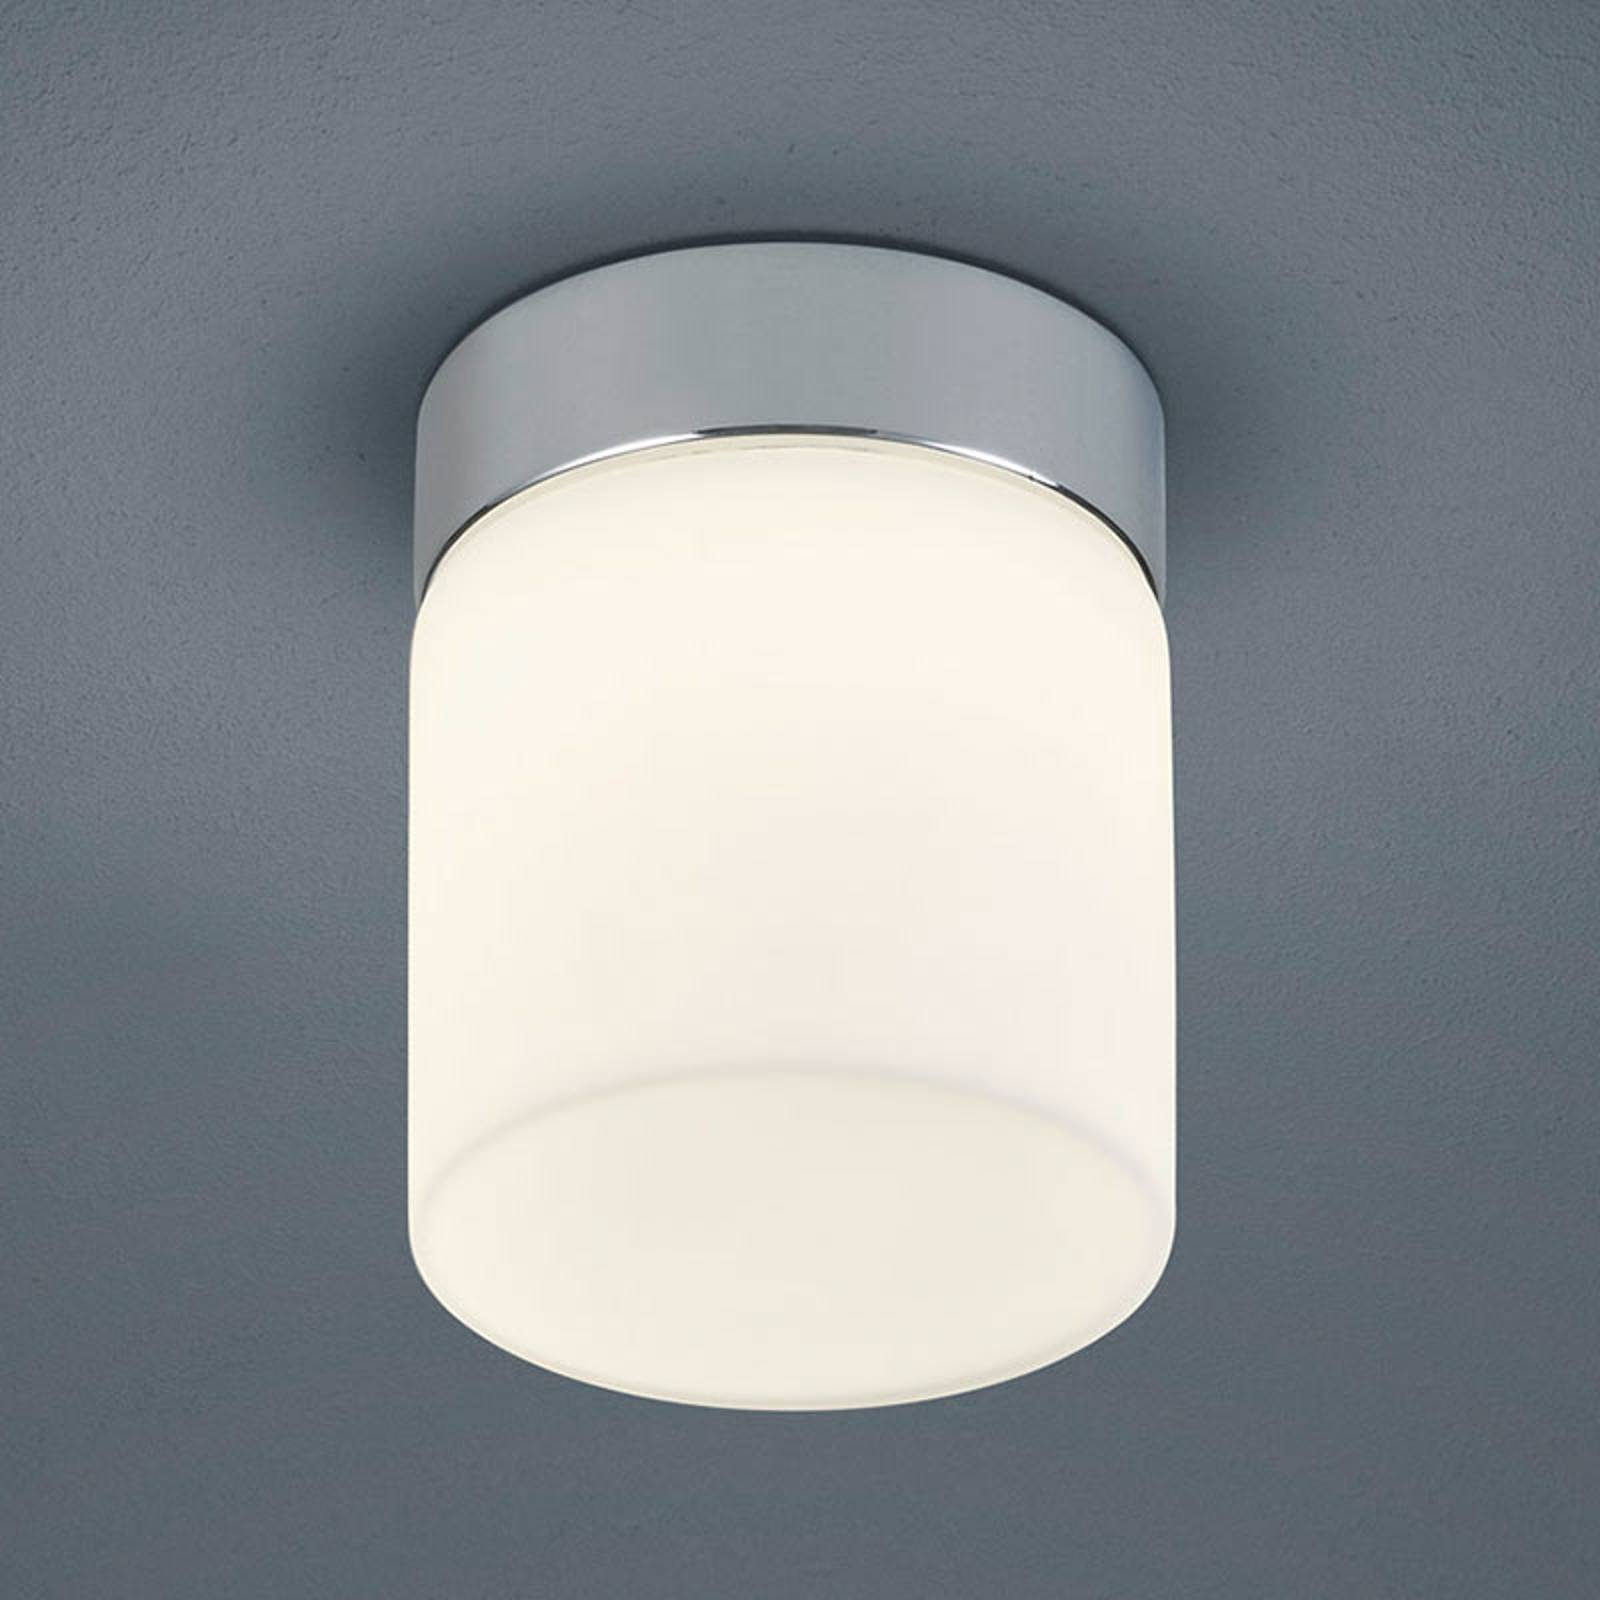 Helestra Keto - LED badkamer-plafondlamp, cilinder